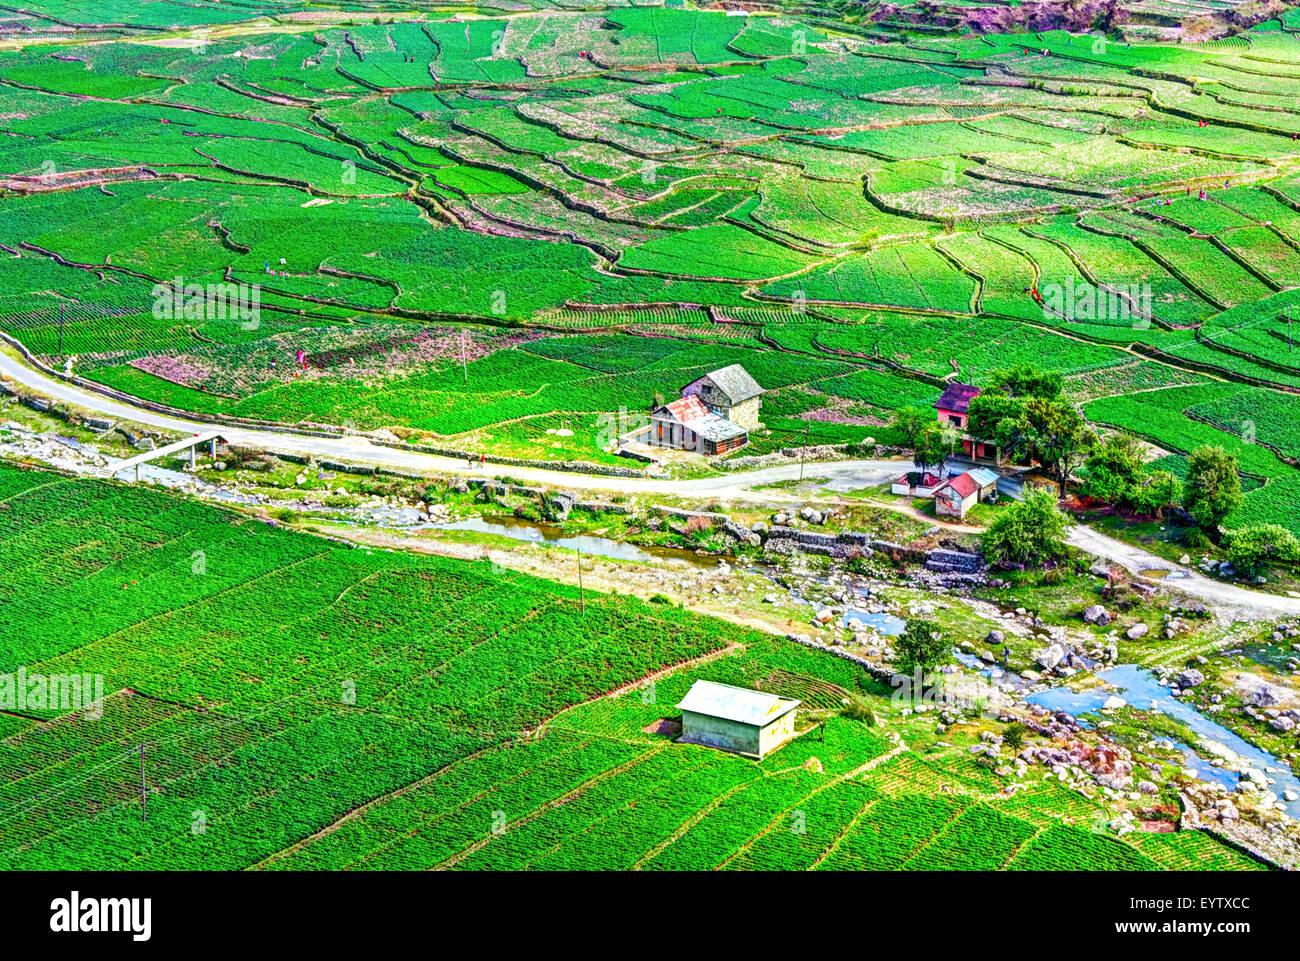 landscape of beautiful green potato fields or farmland on terraced highland at Daman, Palung, Nepal - Stock Image